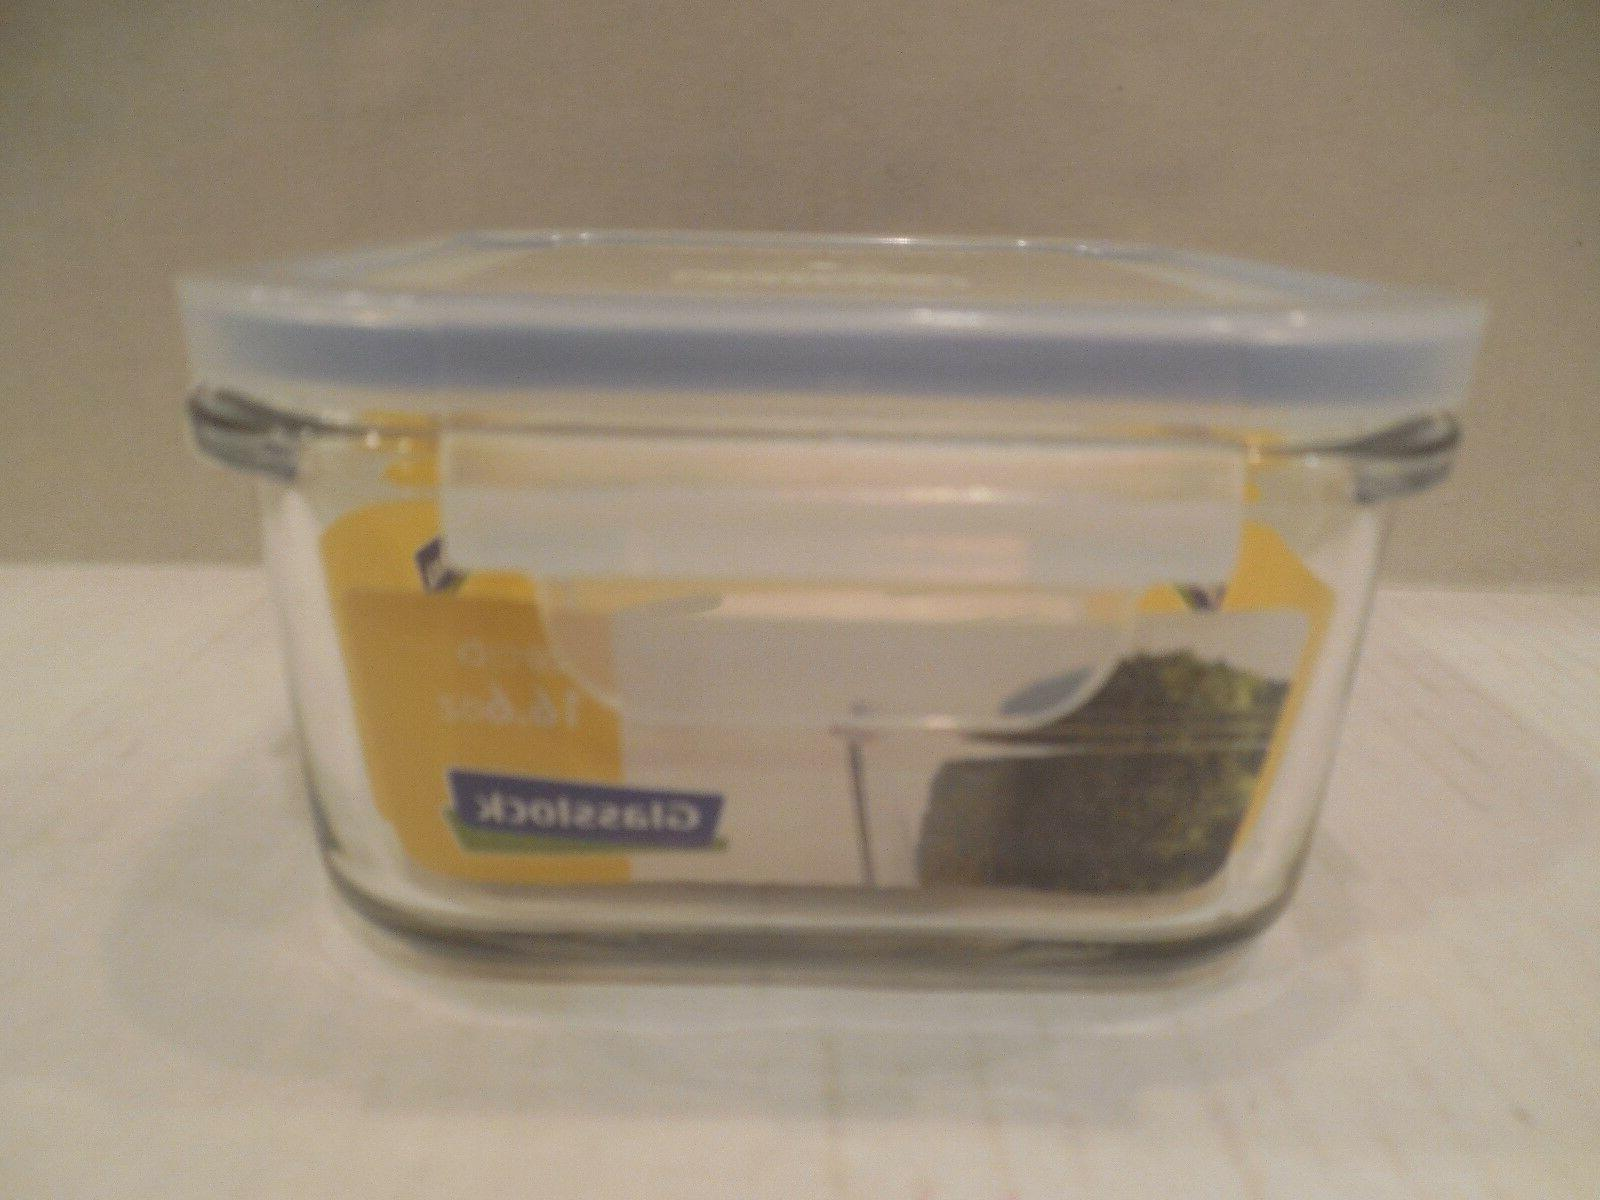 Glasslock Tempered Glass 16.6 Oz Square Glass Food Storage C